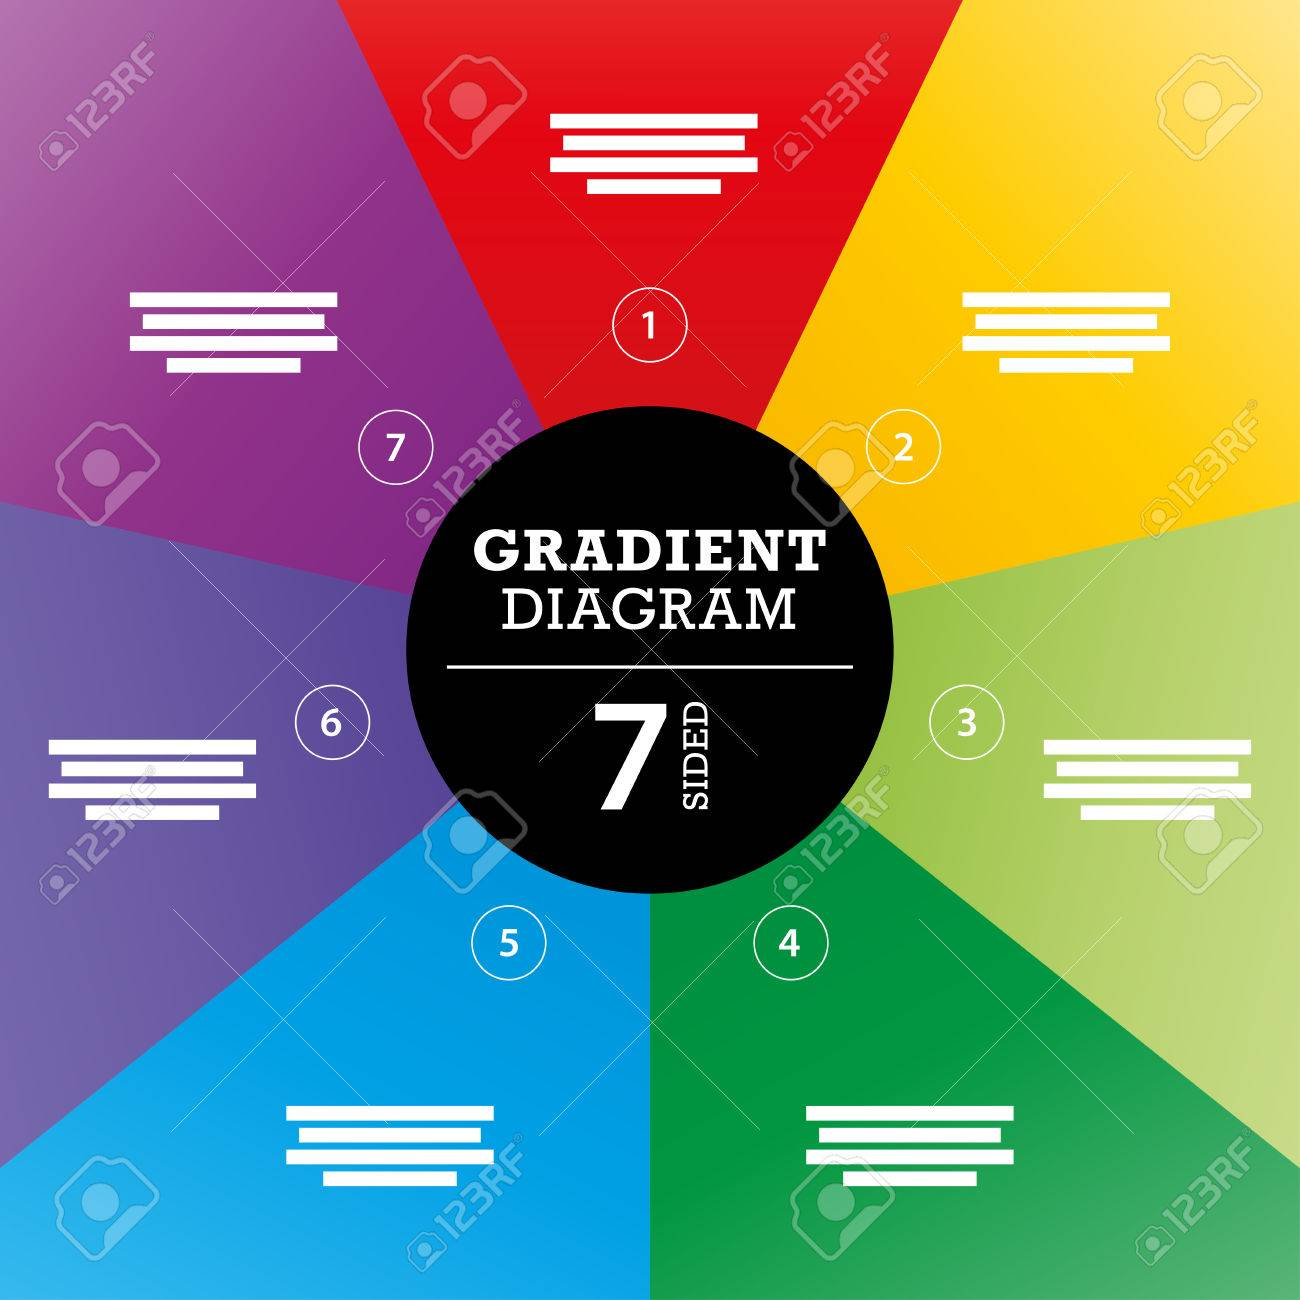 Gradient full background stripe diagram vector - 30818868